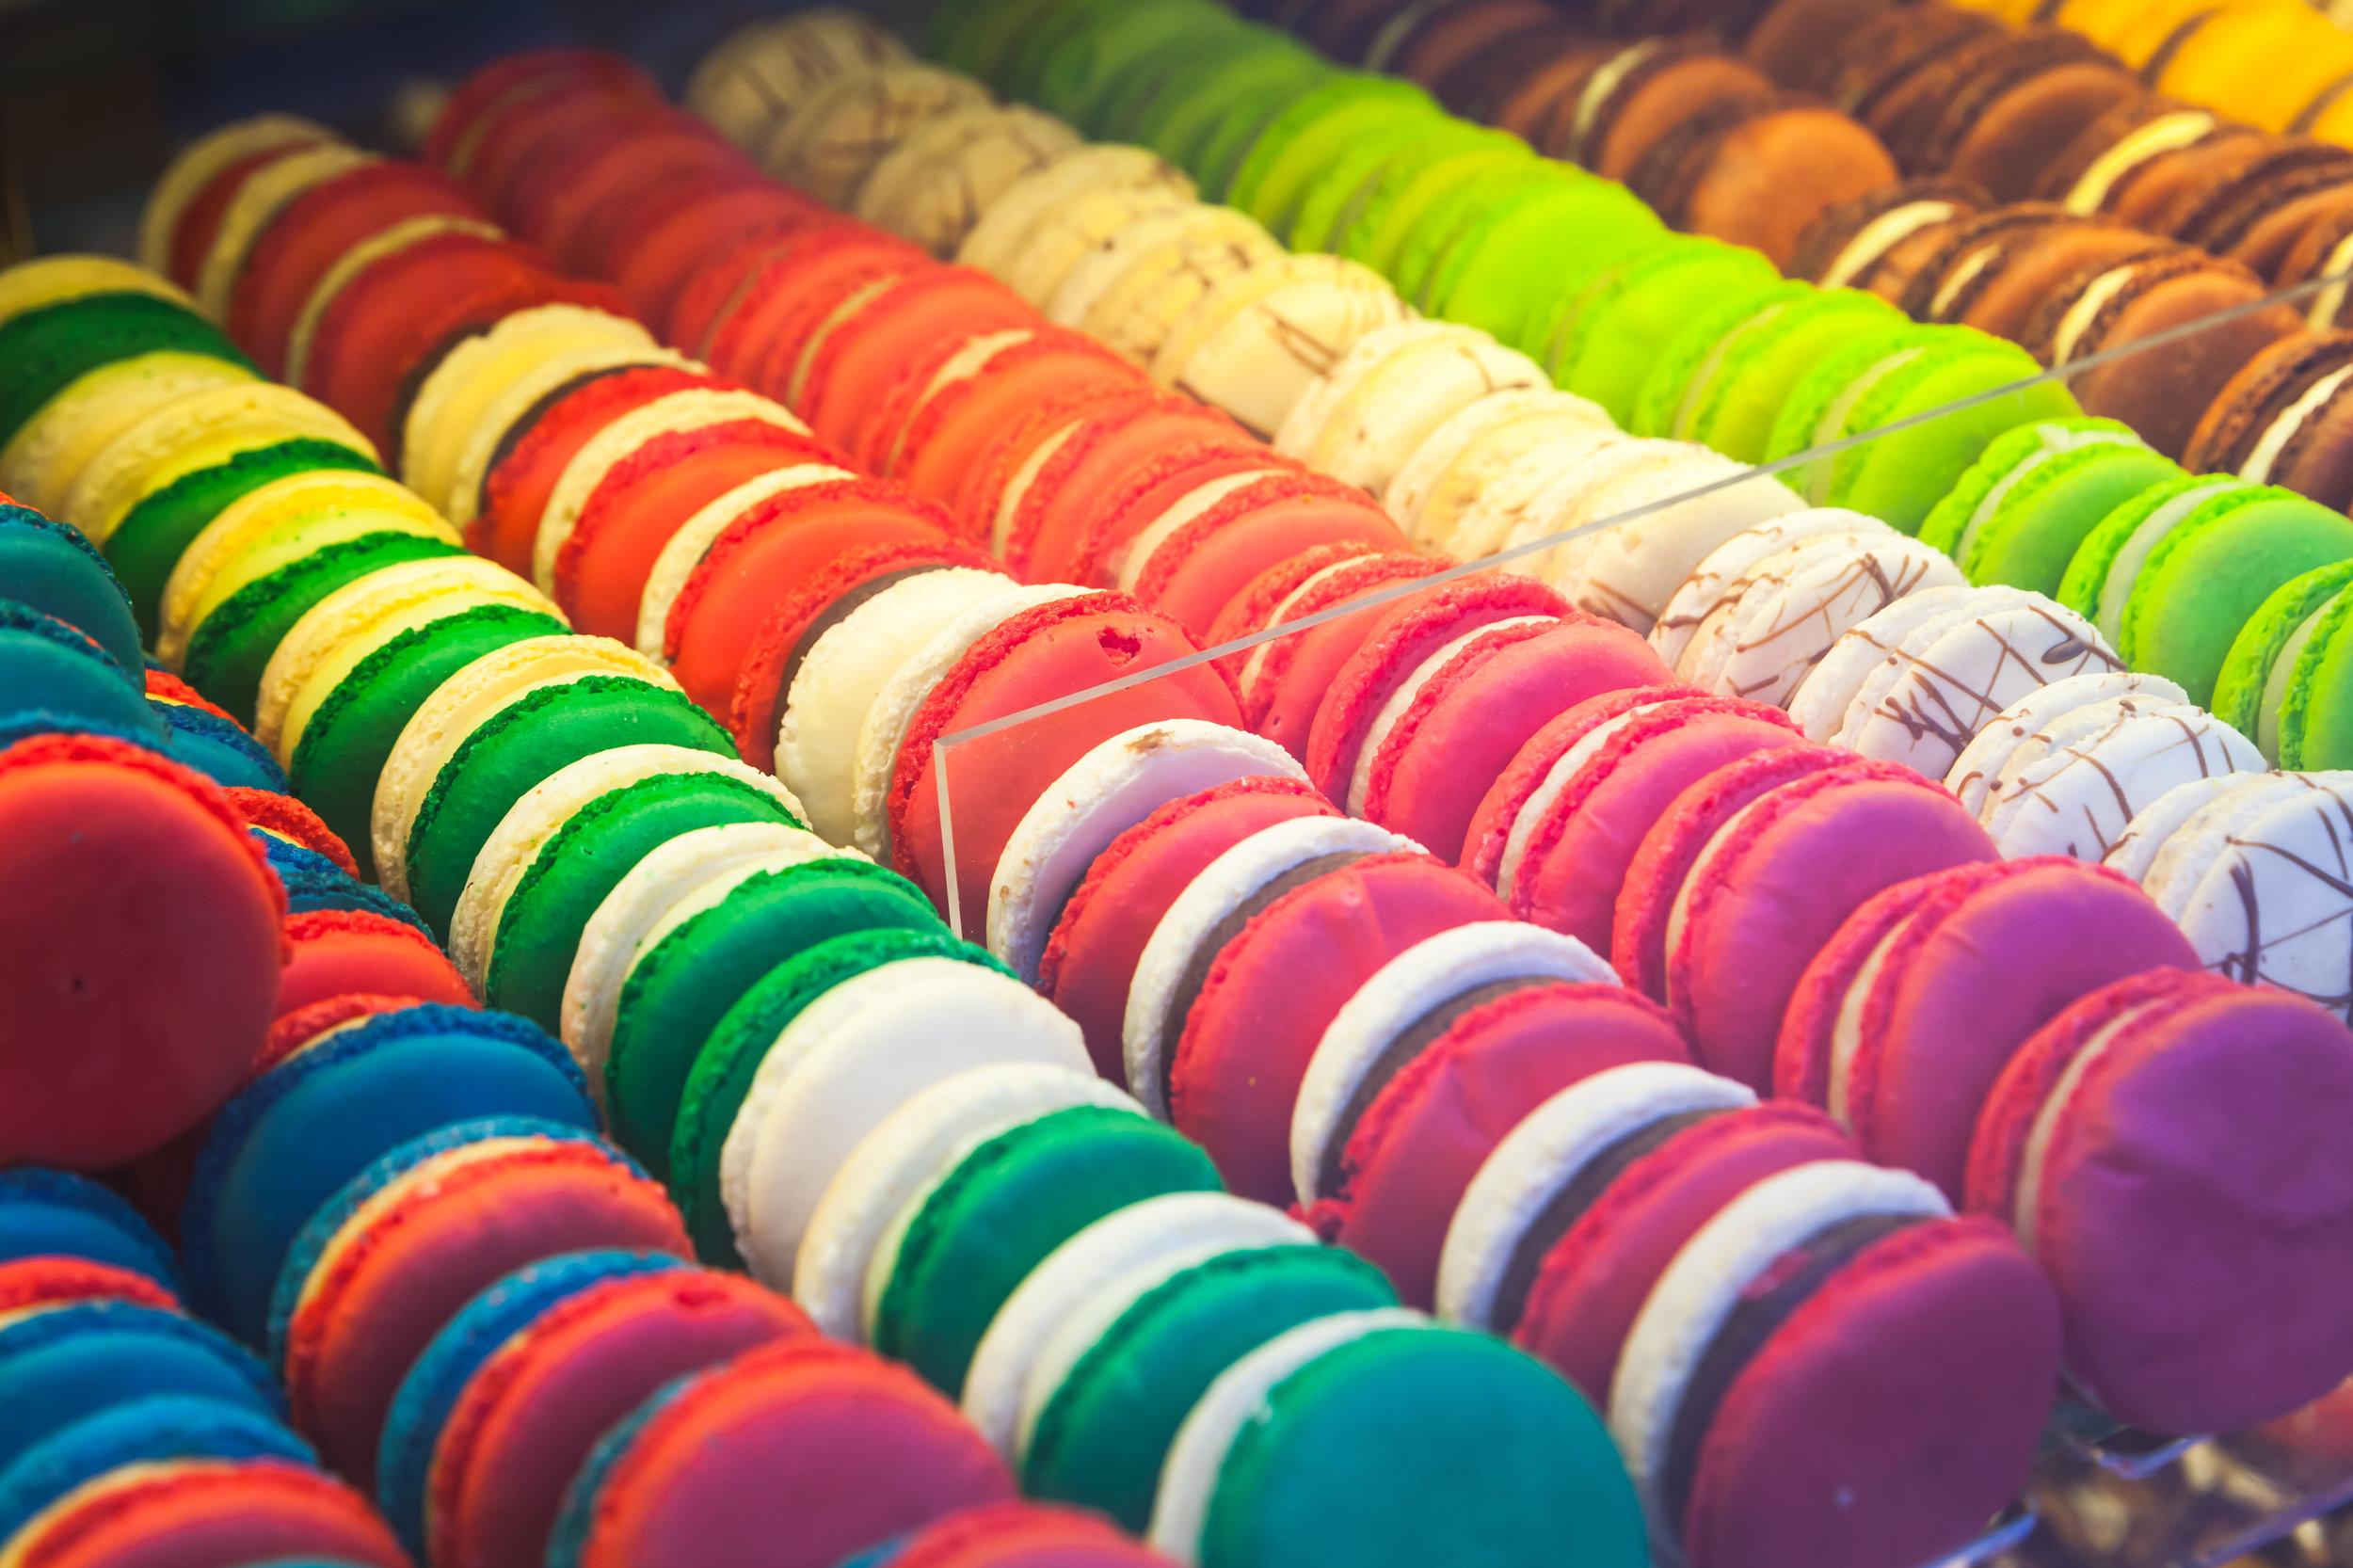 bigstock-Assortment-Of-Colorful-Traditi-181136095.jpg